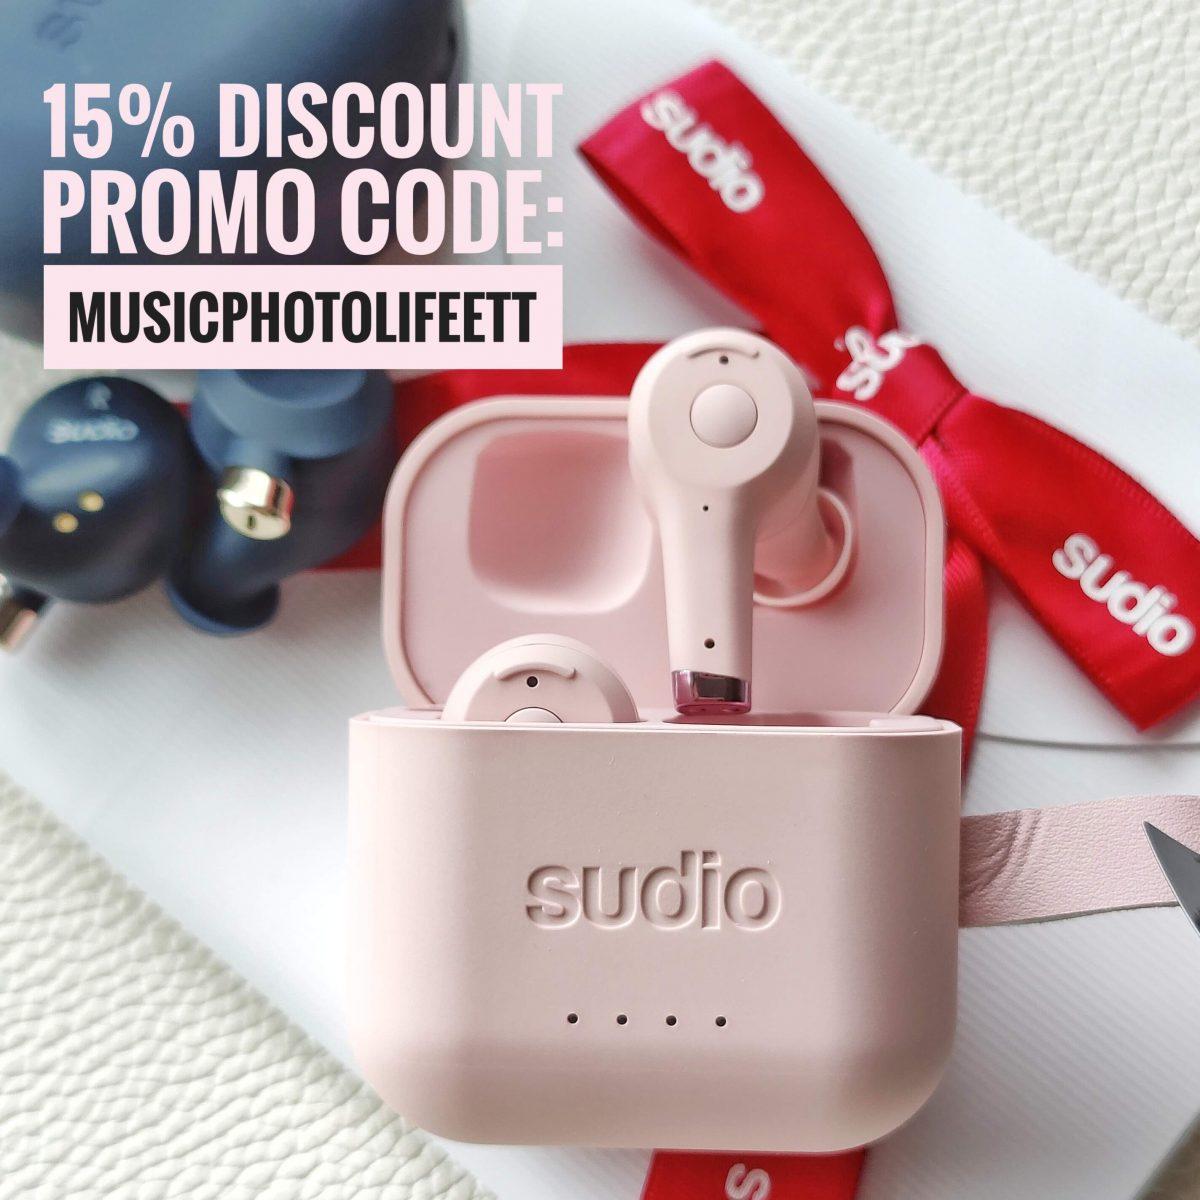 Sudio discount code